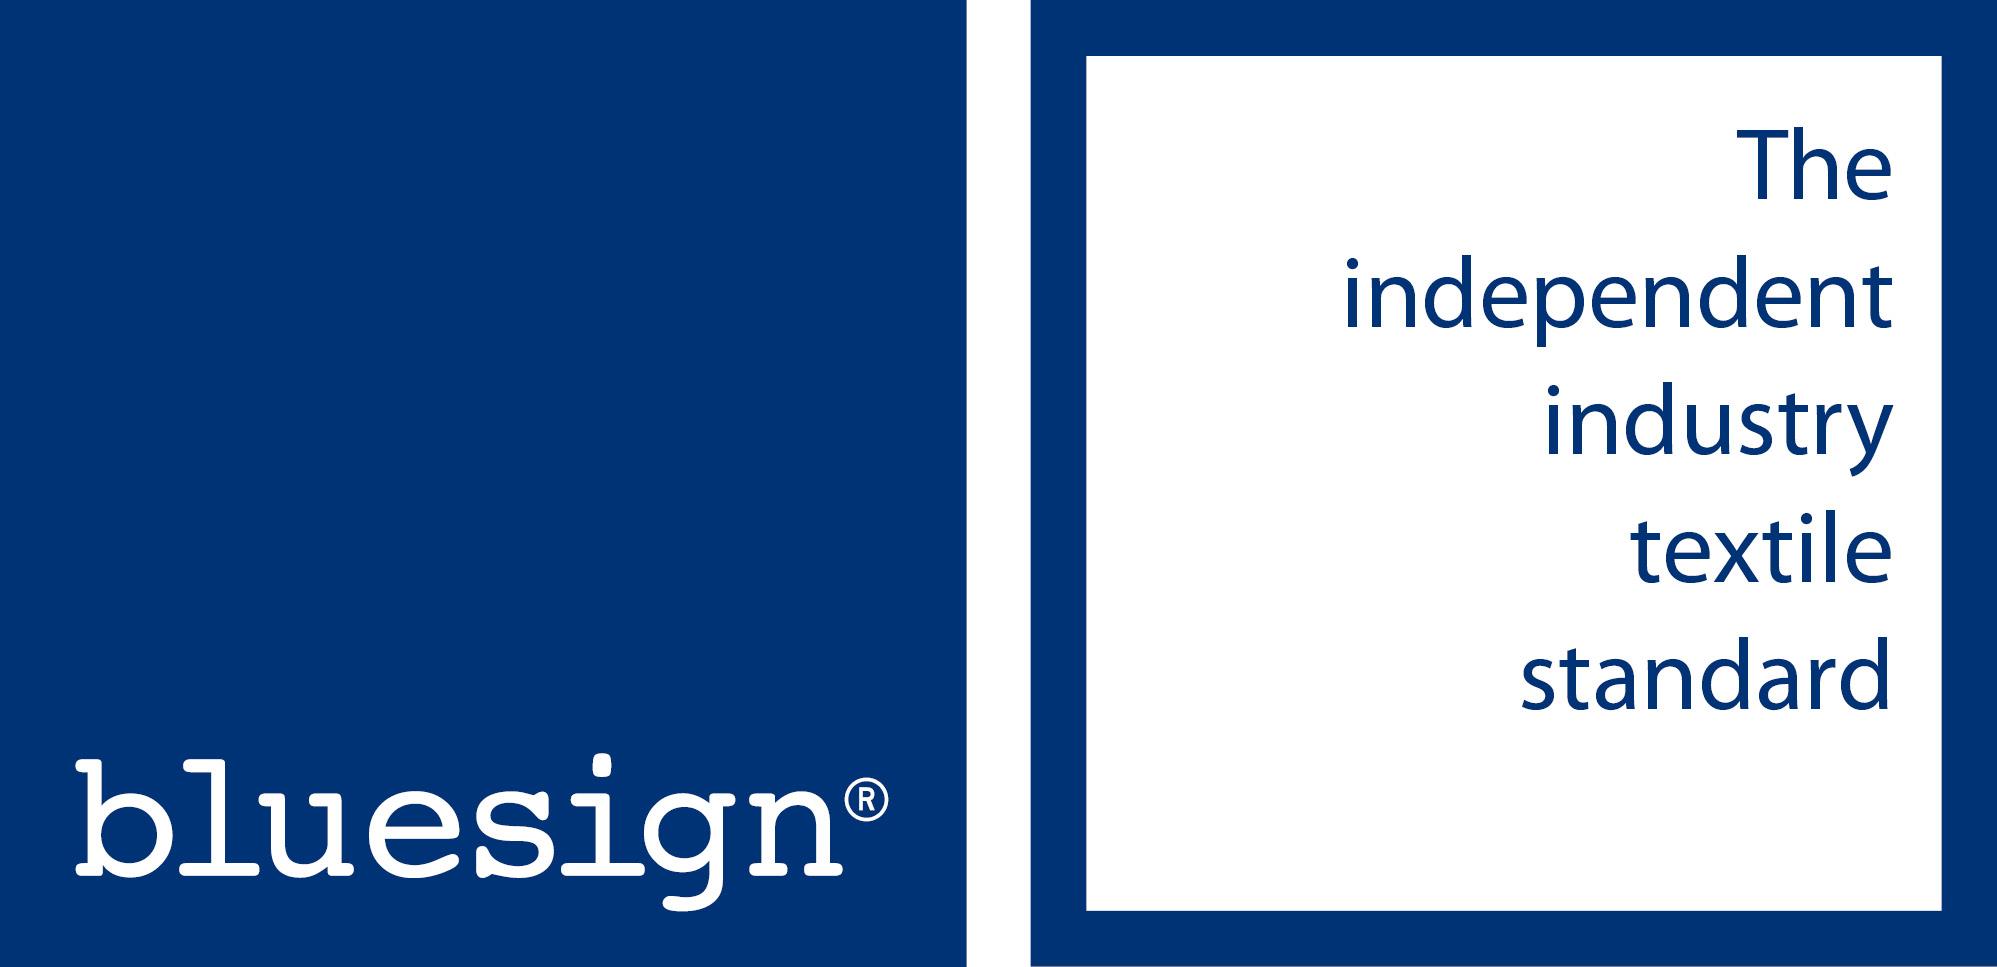 bluesign_logo1.jpg